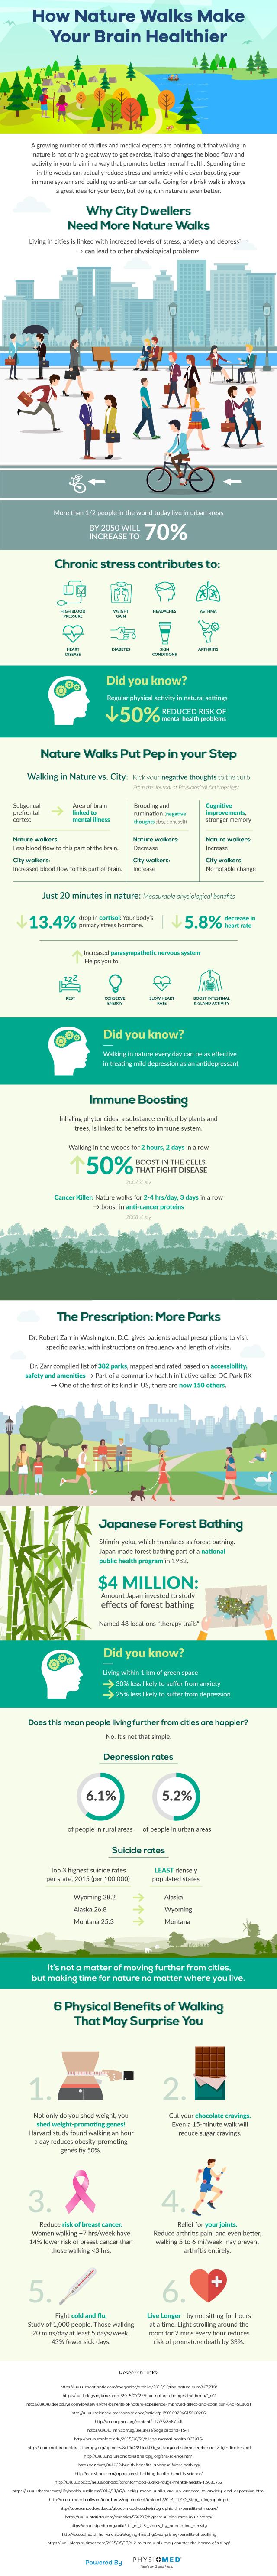 benefits of walking in nature